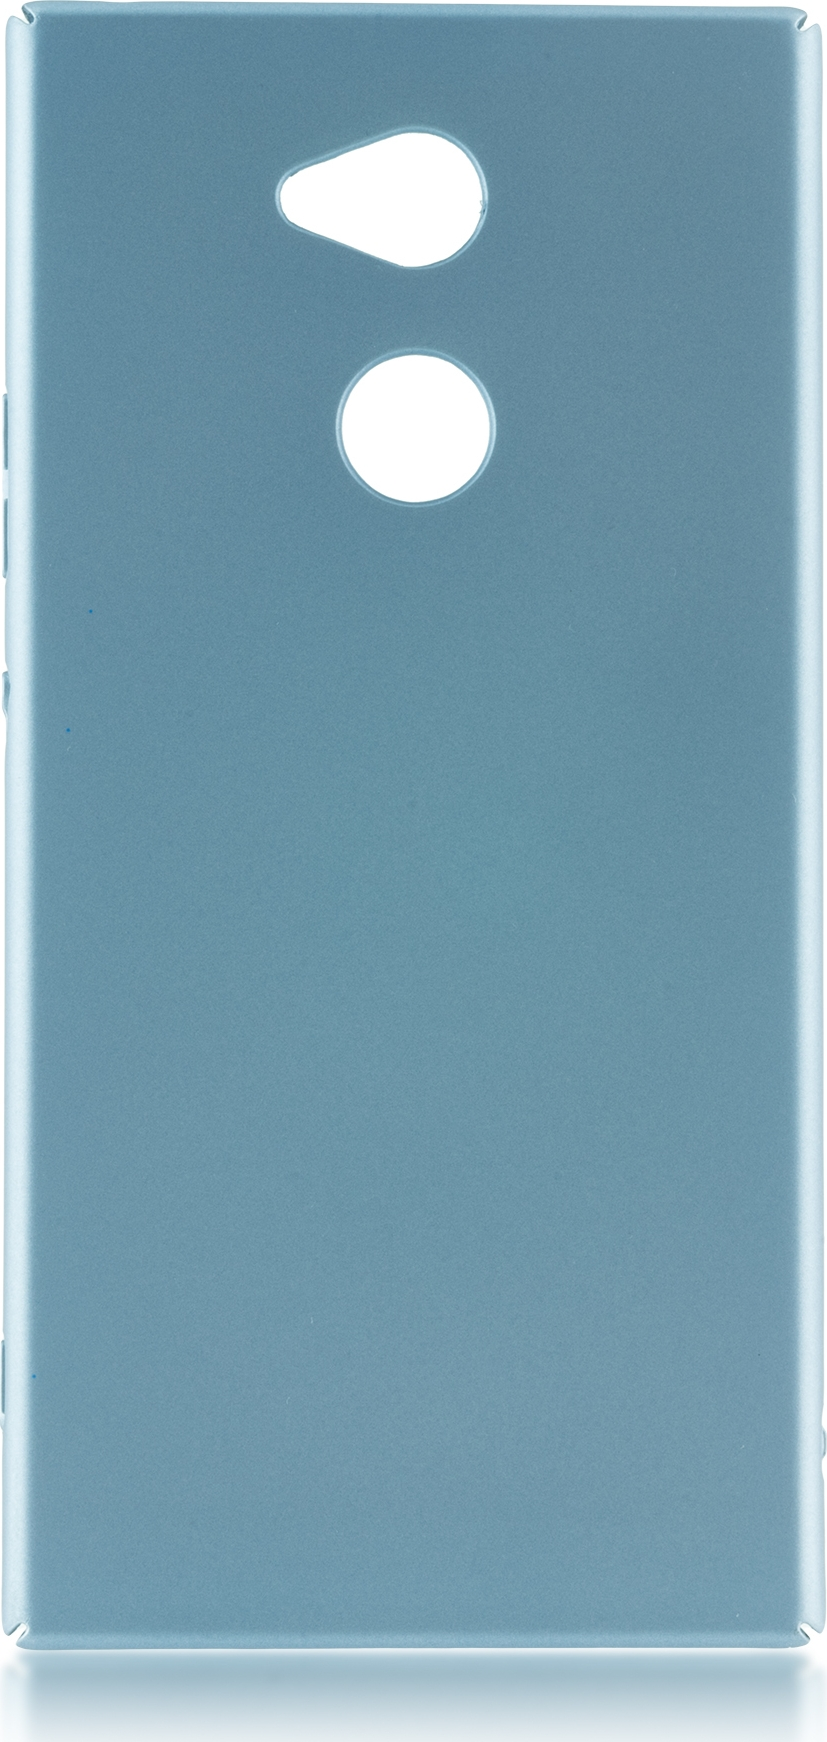 Чехол Brosco 4Side Soft-Touch для Sony Xperia XA2 Ultra, голубой чехол для сотового телефона brosco для sony xa2 ultra xa2u book gold золотой